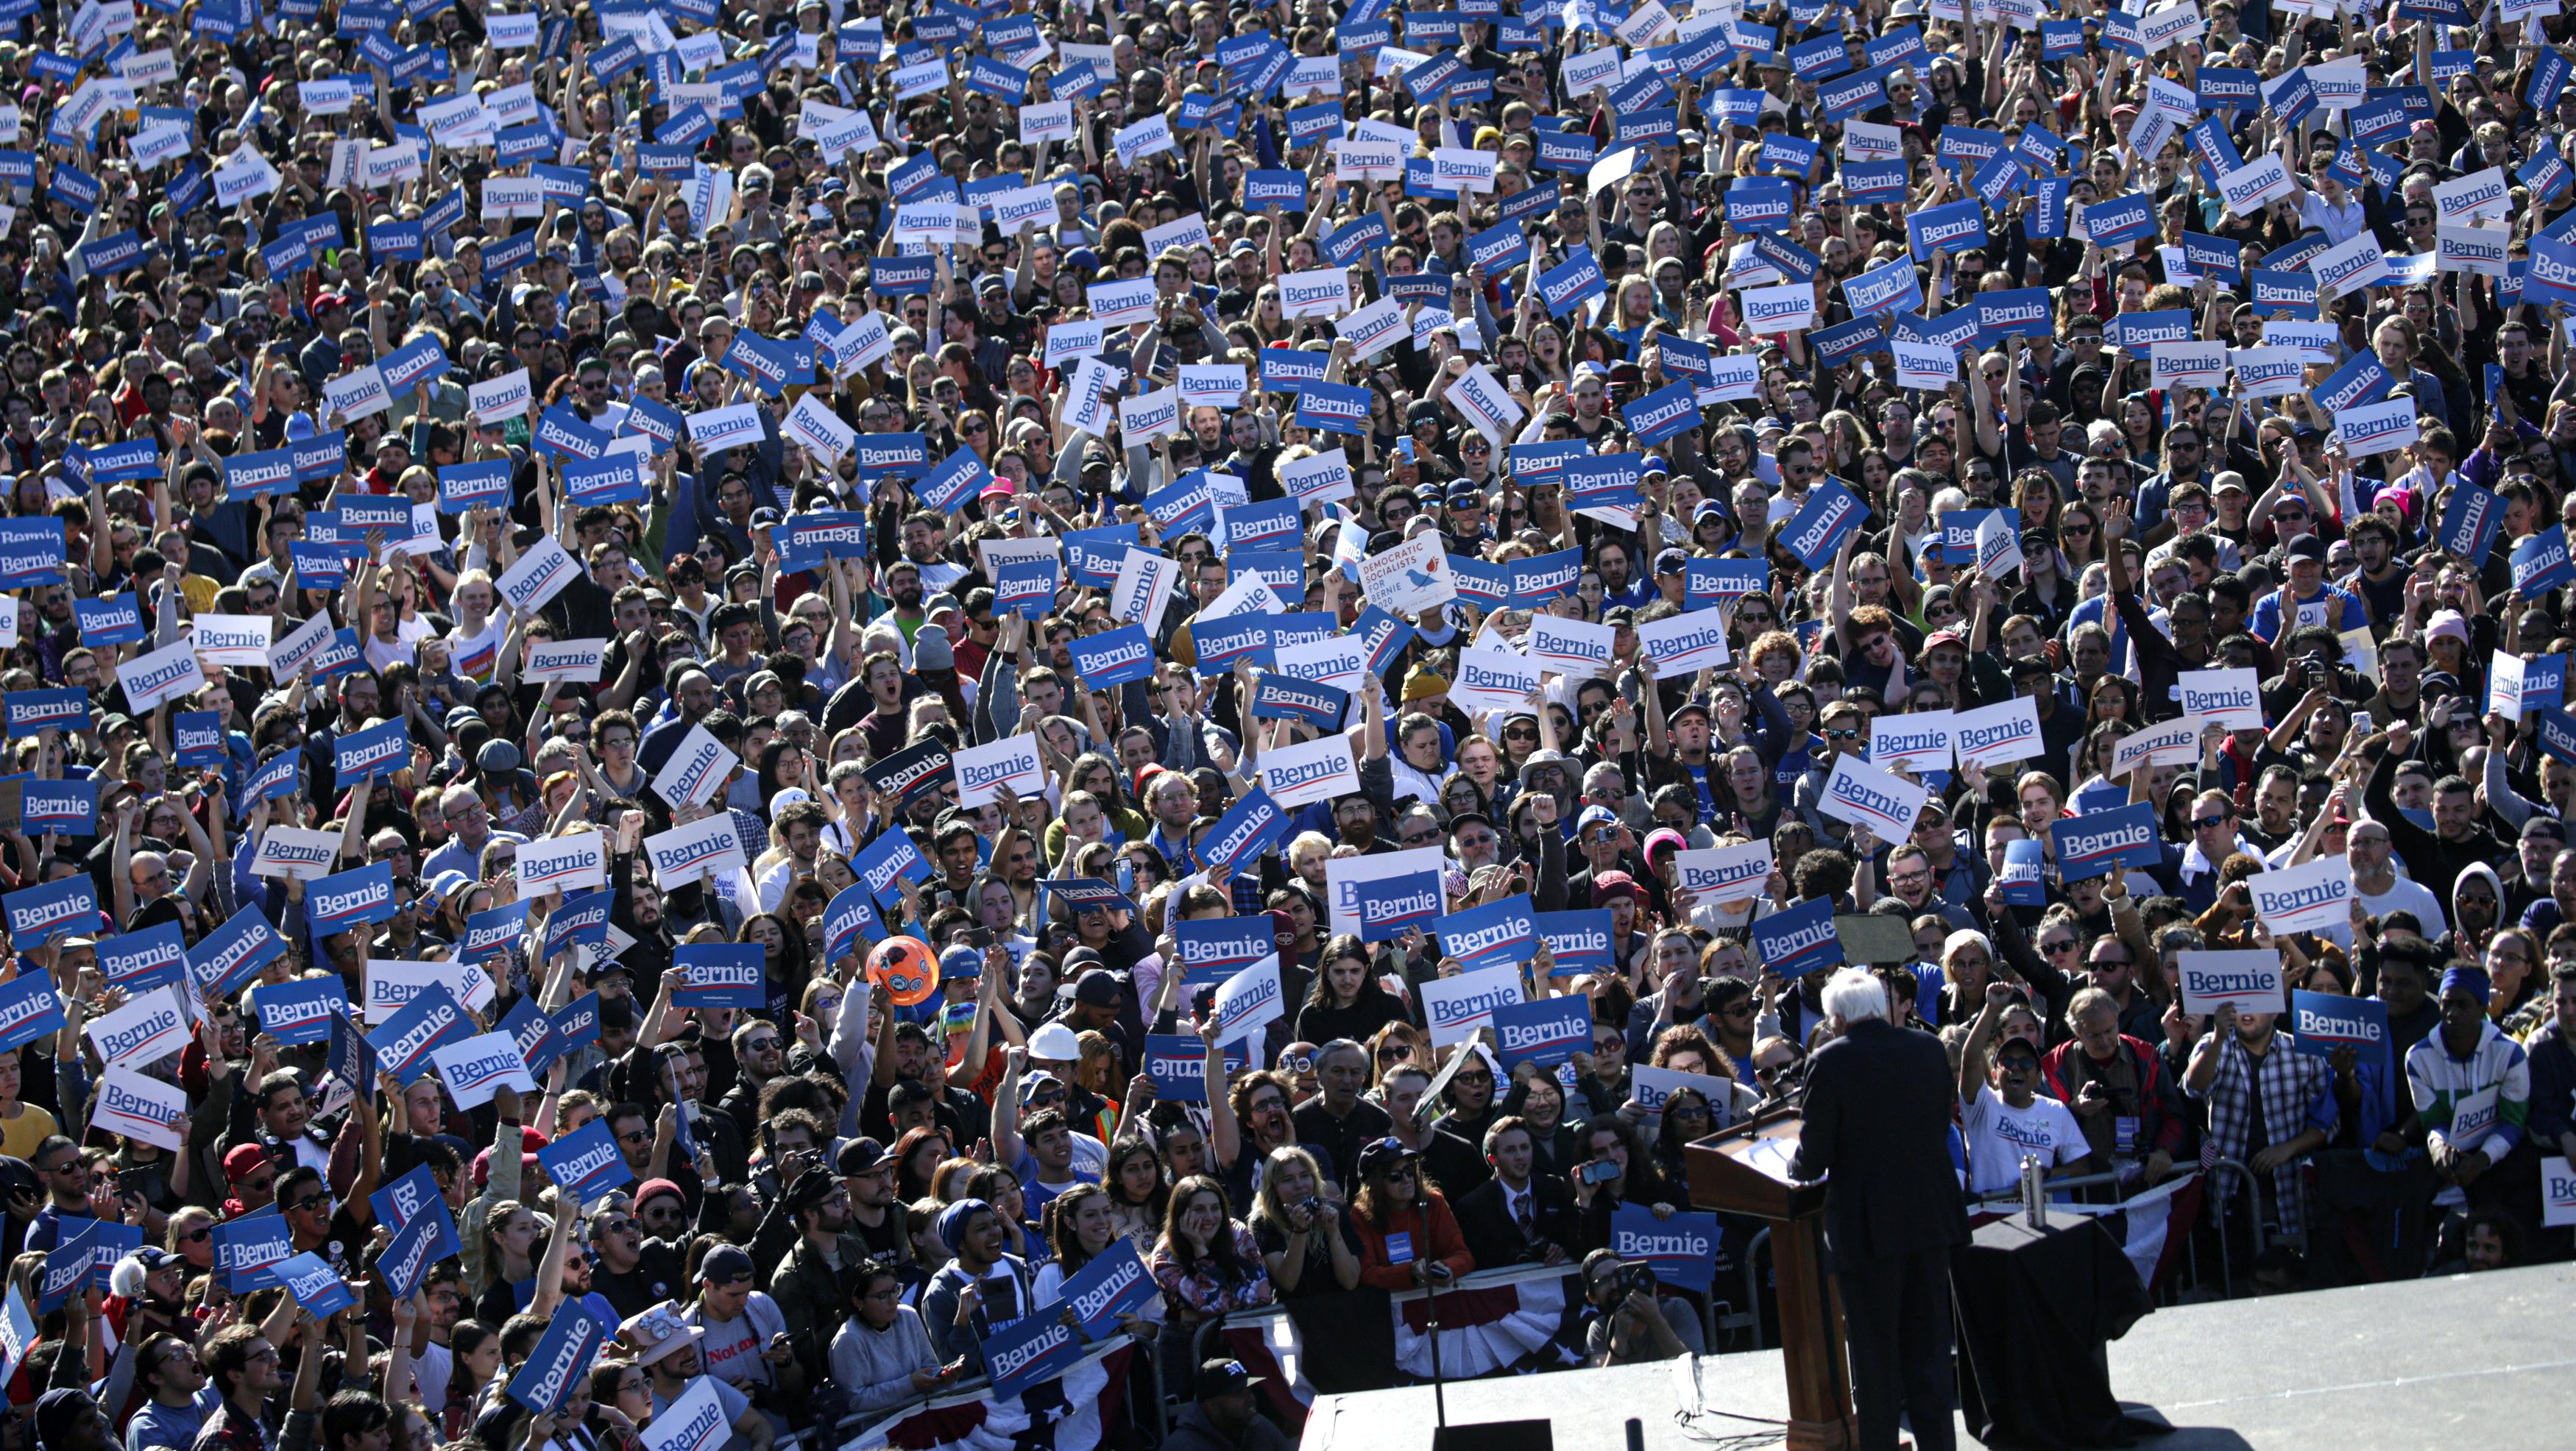 'I Am Back': How Bernie Sanders' Revolution Is Proving Resilient